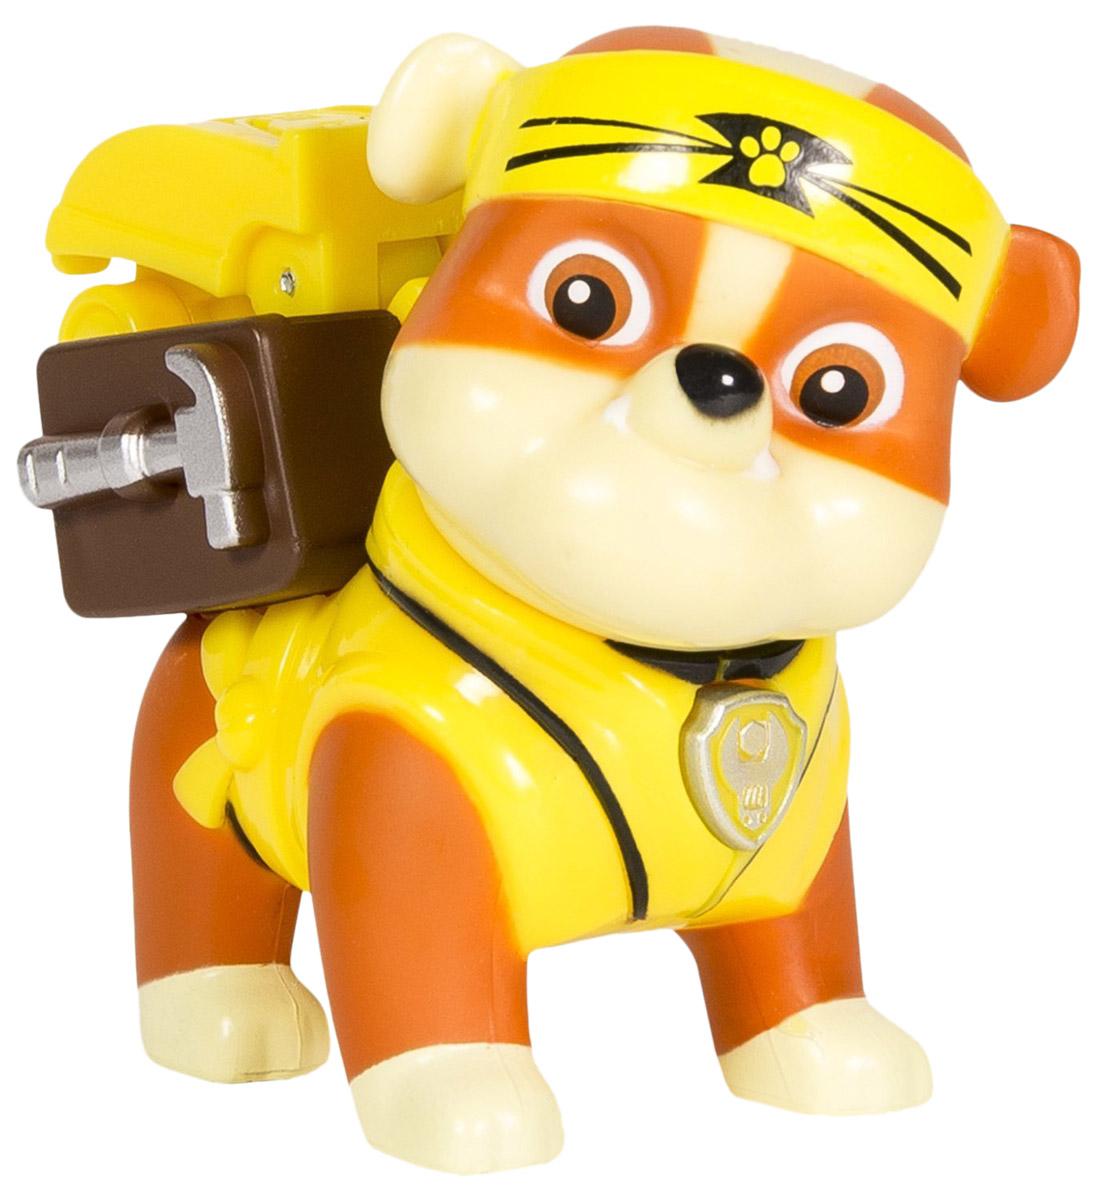 Paw Patrol Фигурка Rubble с рюкзаком-трансформером paw patrol фигурка pup fu rubble